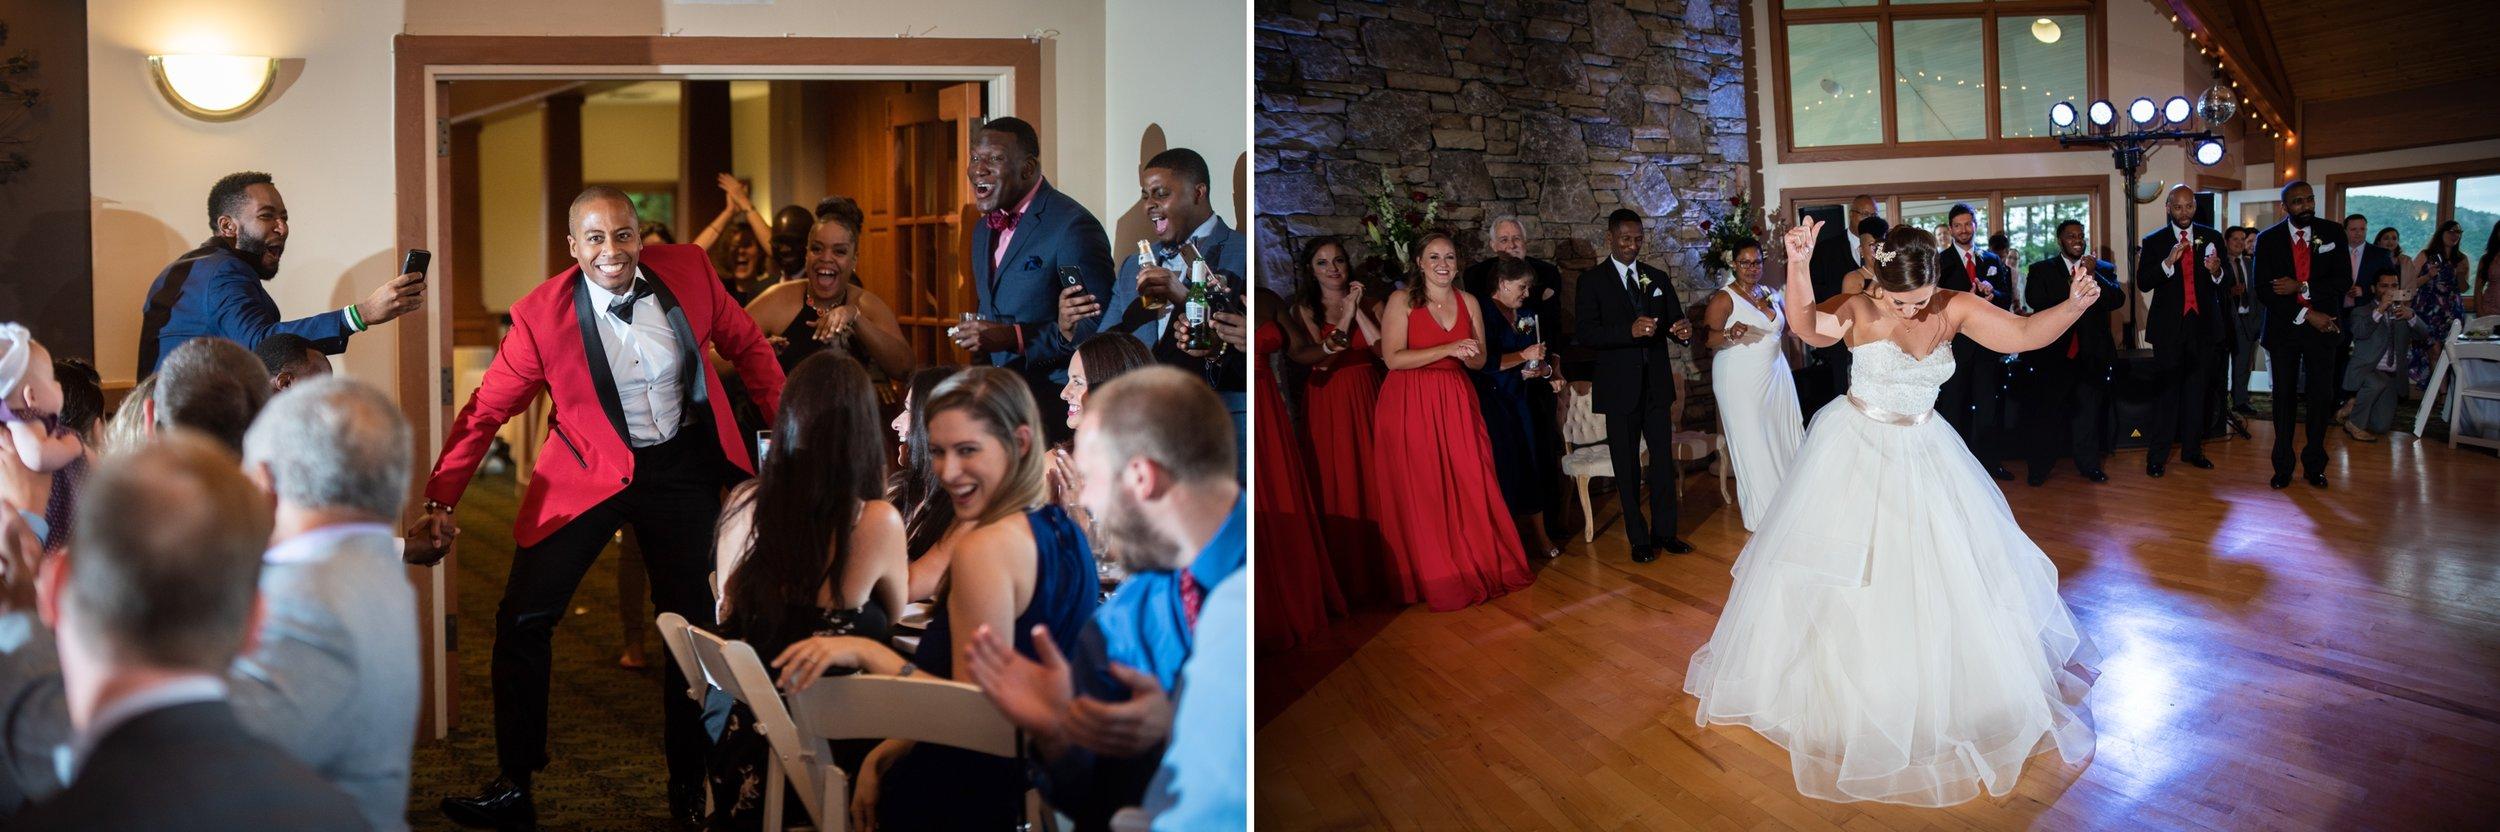 High Vista Weddings - Asheville Wedding 2 43.jpg